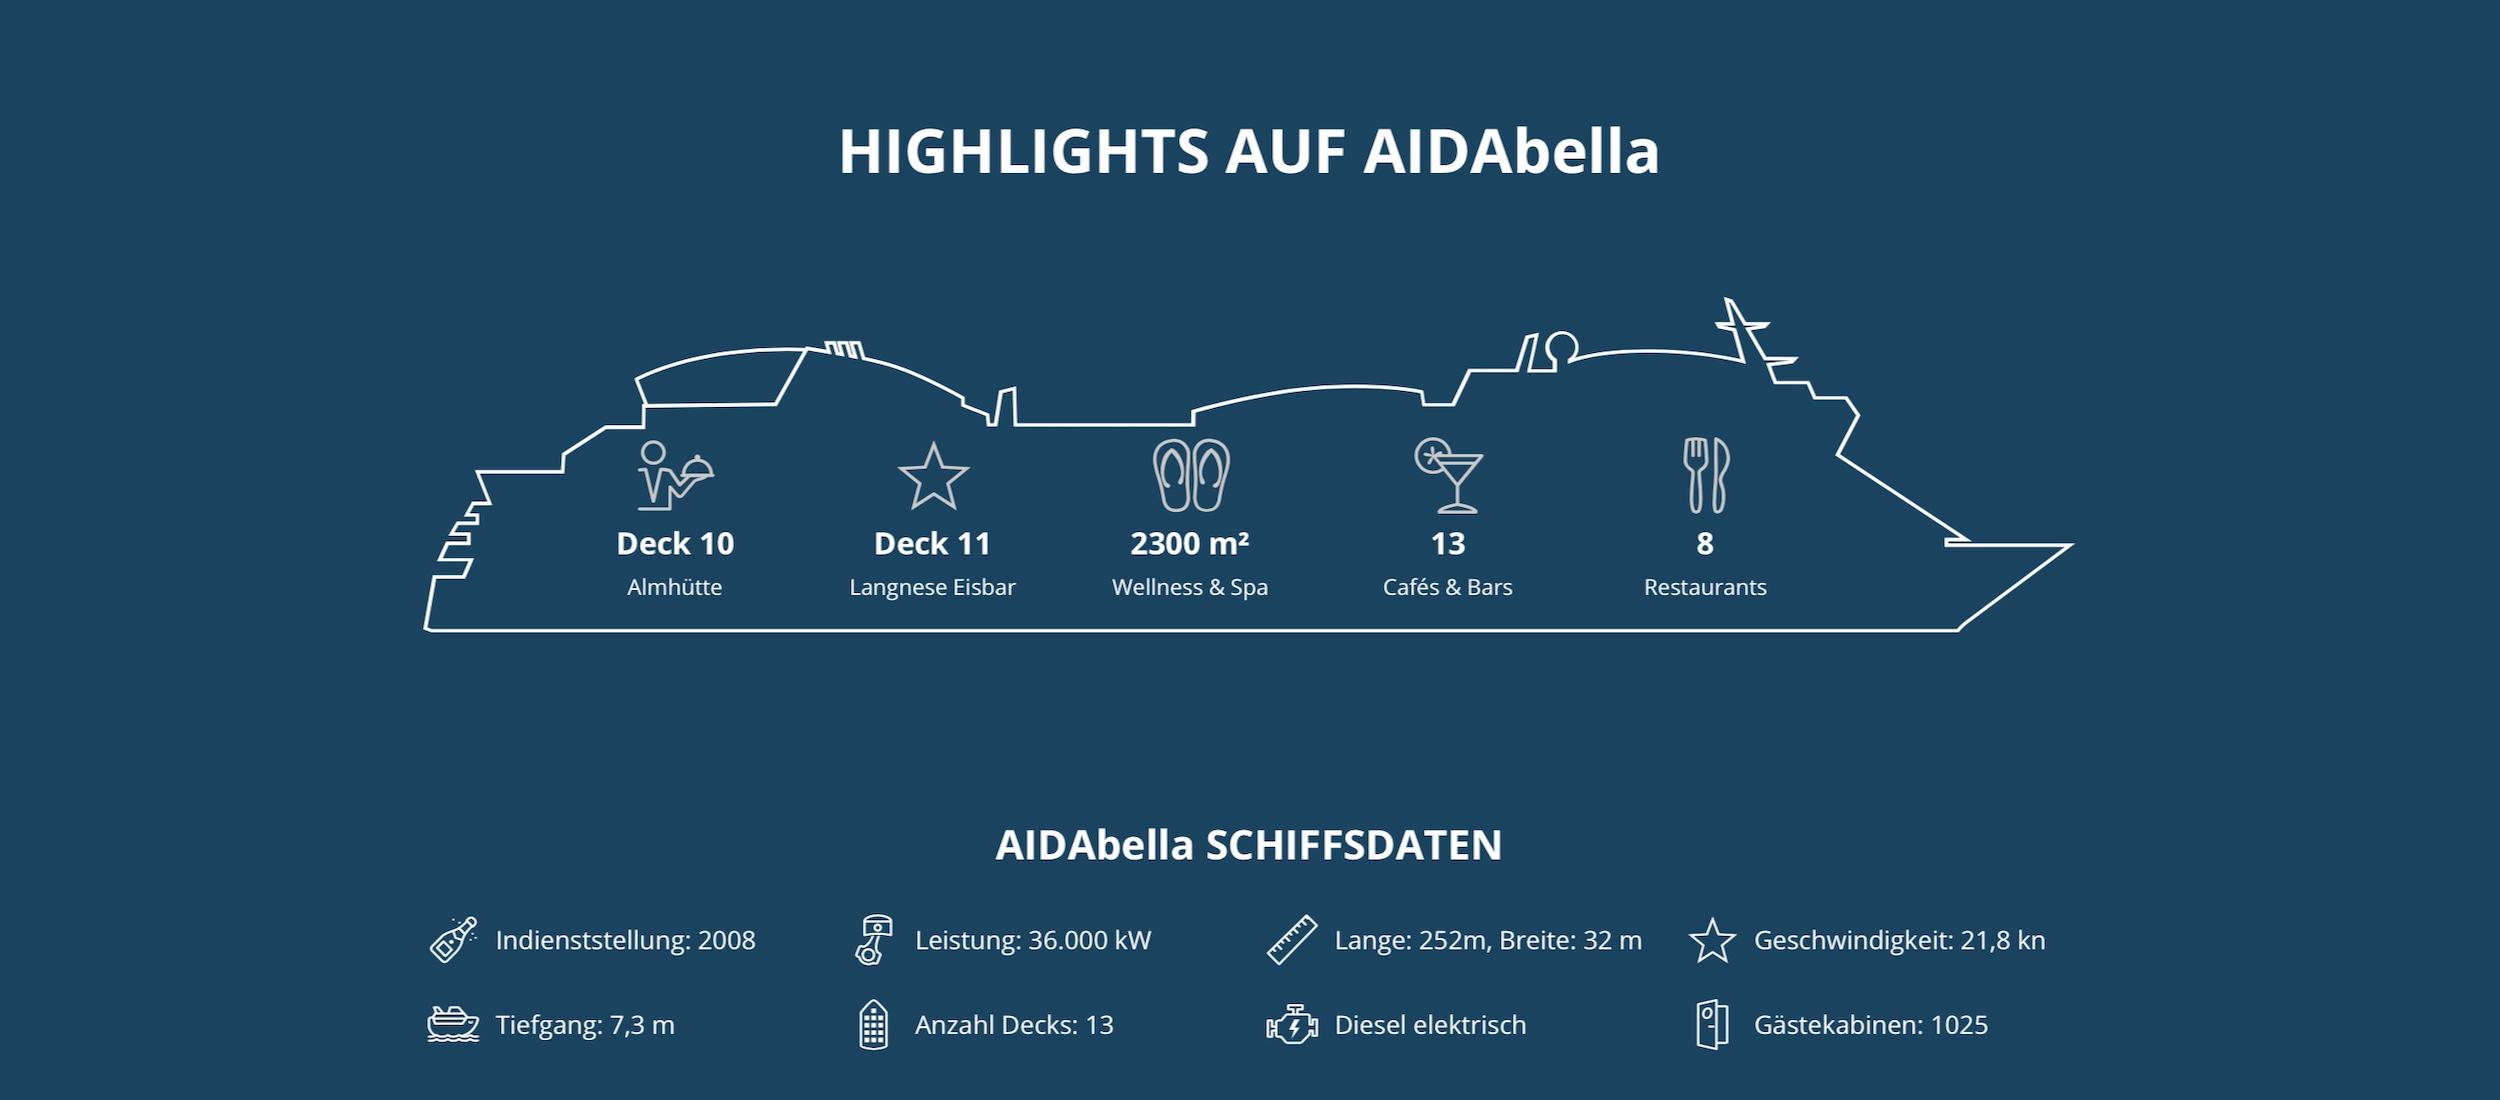 aida-cruises-ships-aidabella-daten